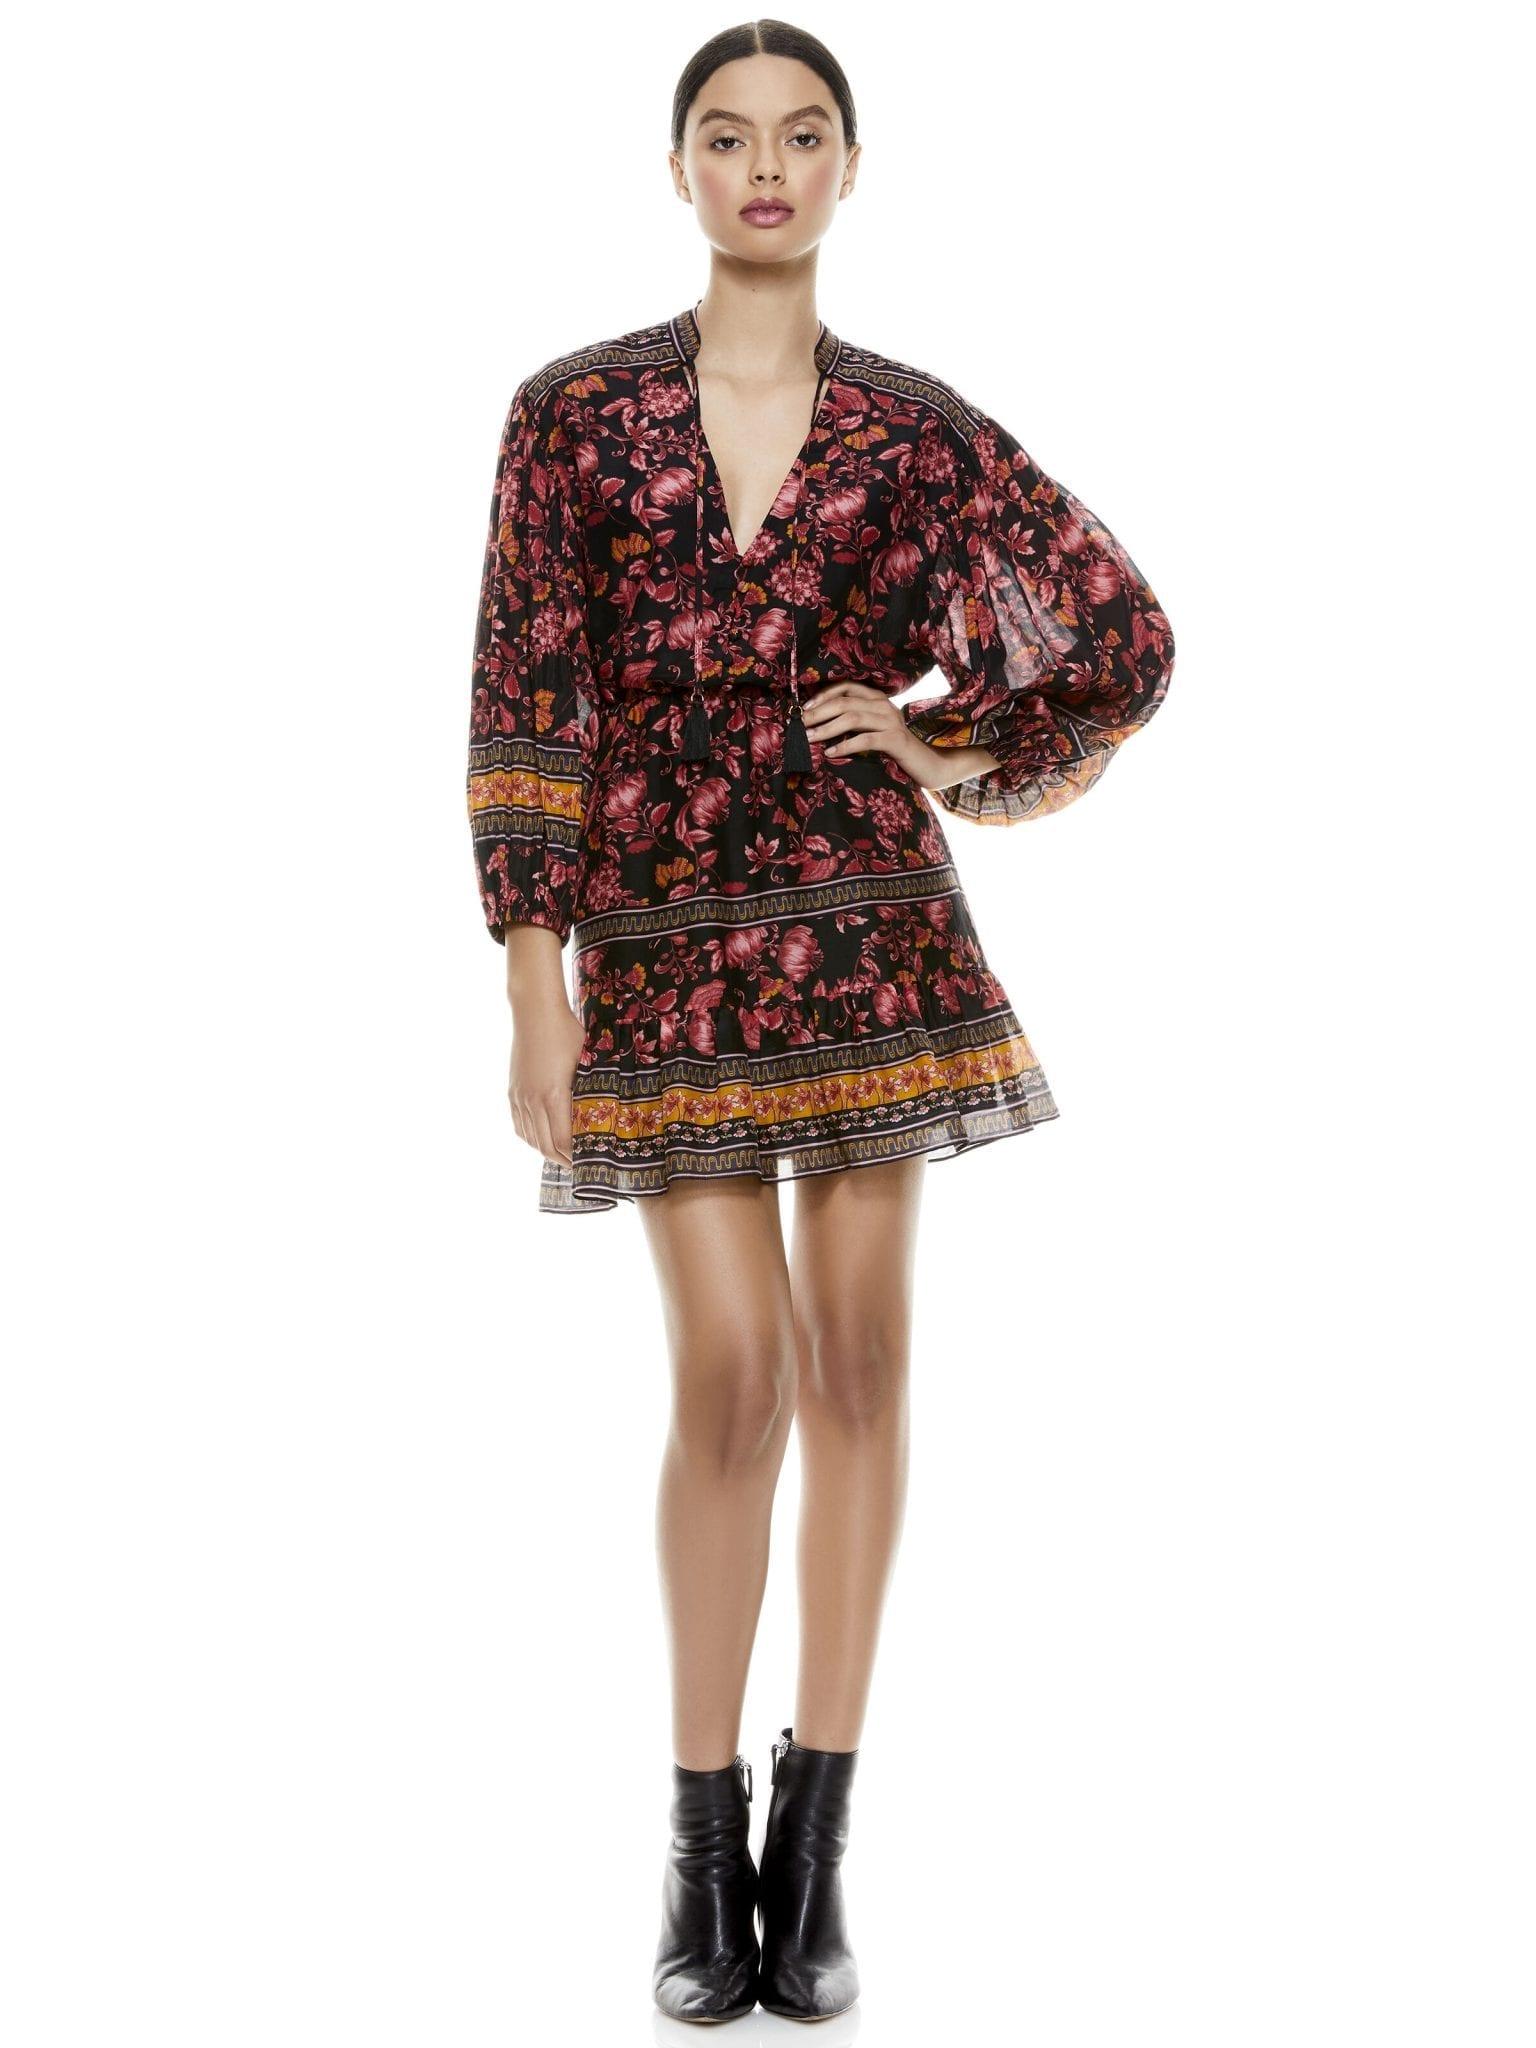 ALICE + OLIVIA Sedona Floral Mini Dress